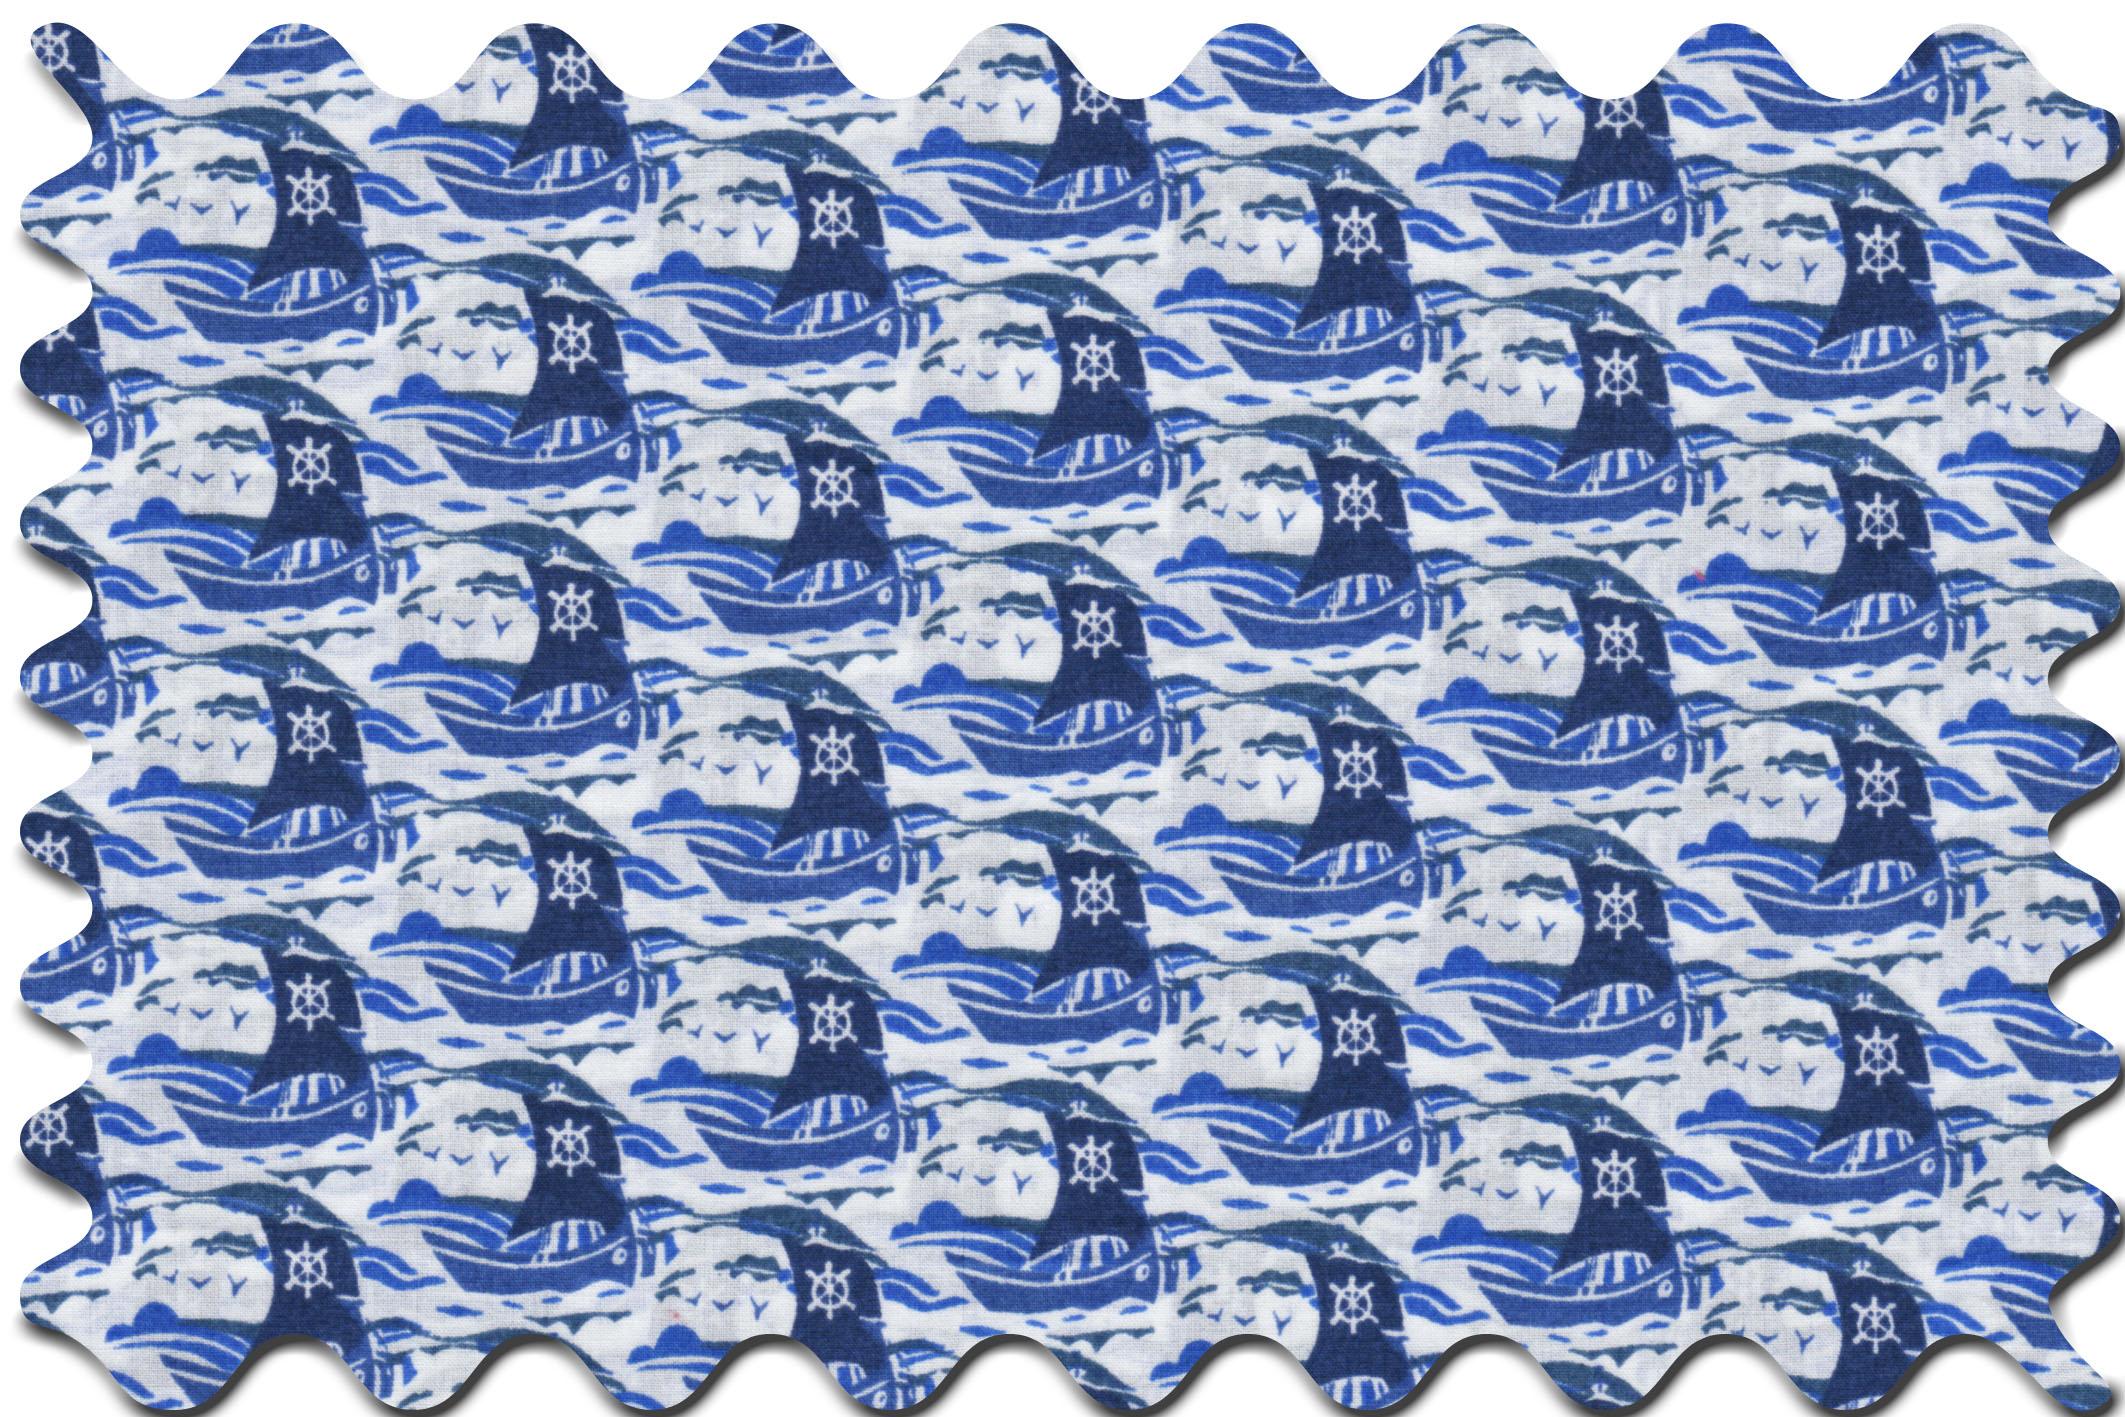 Samoas bleu